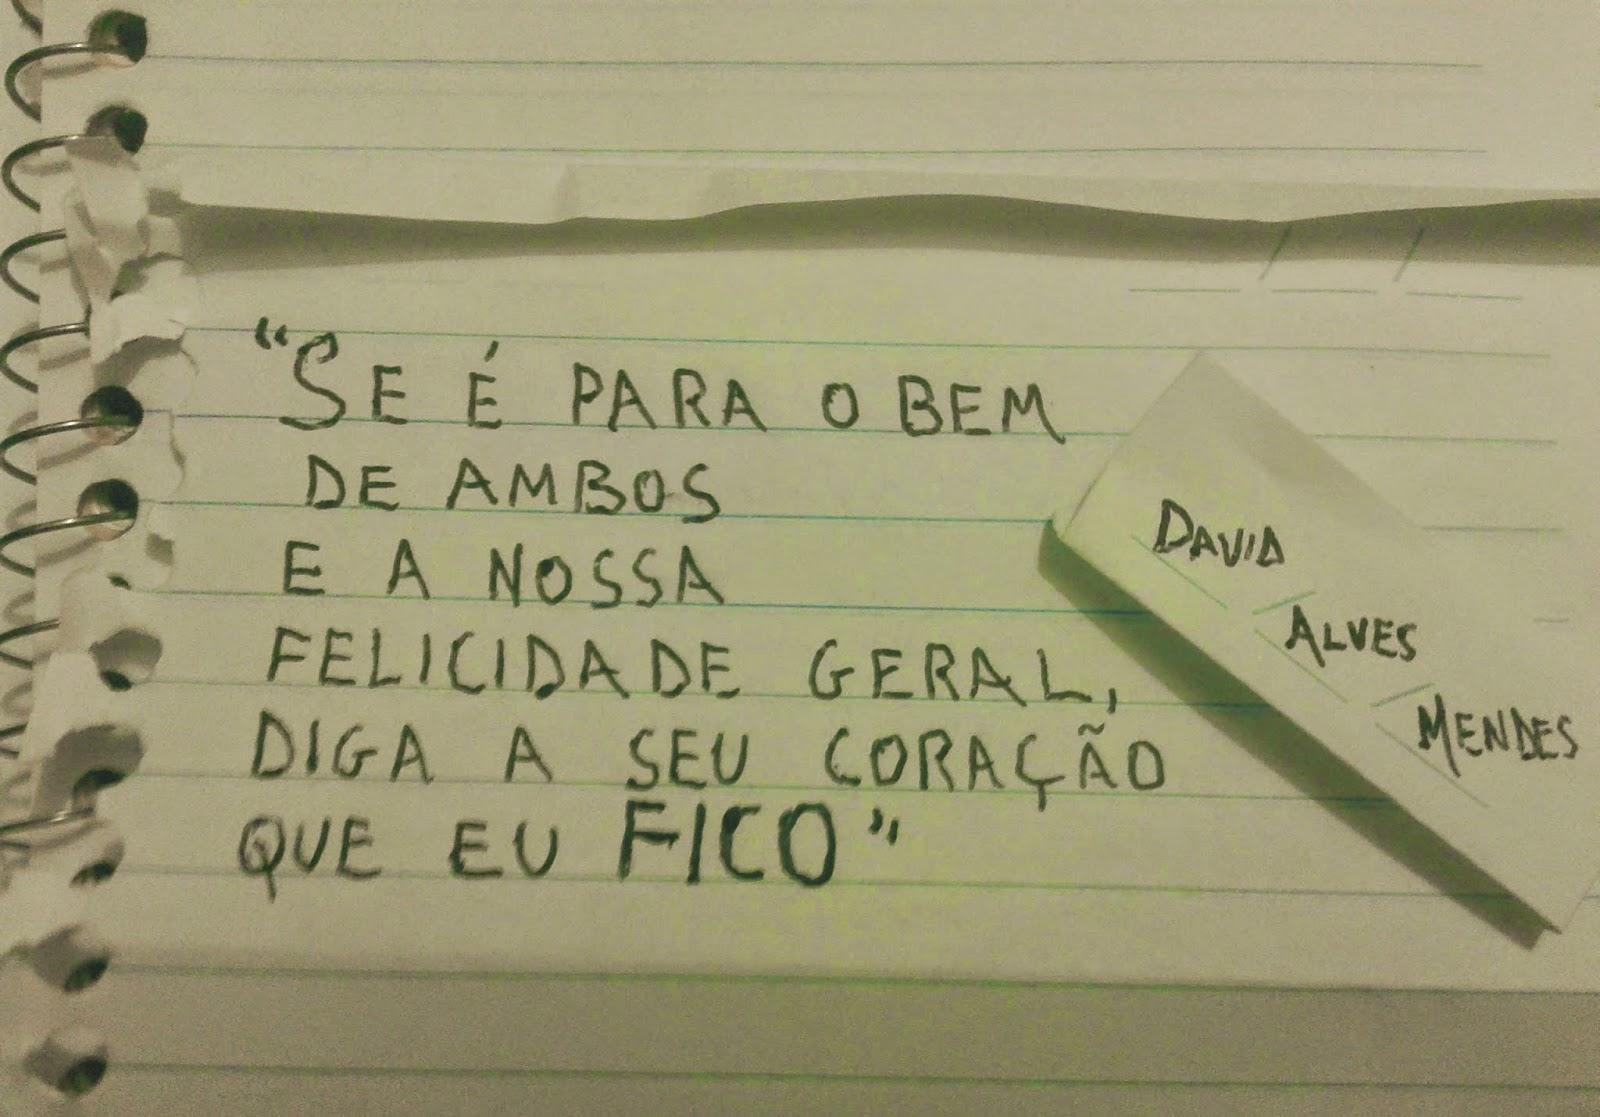 david alves mendes